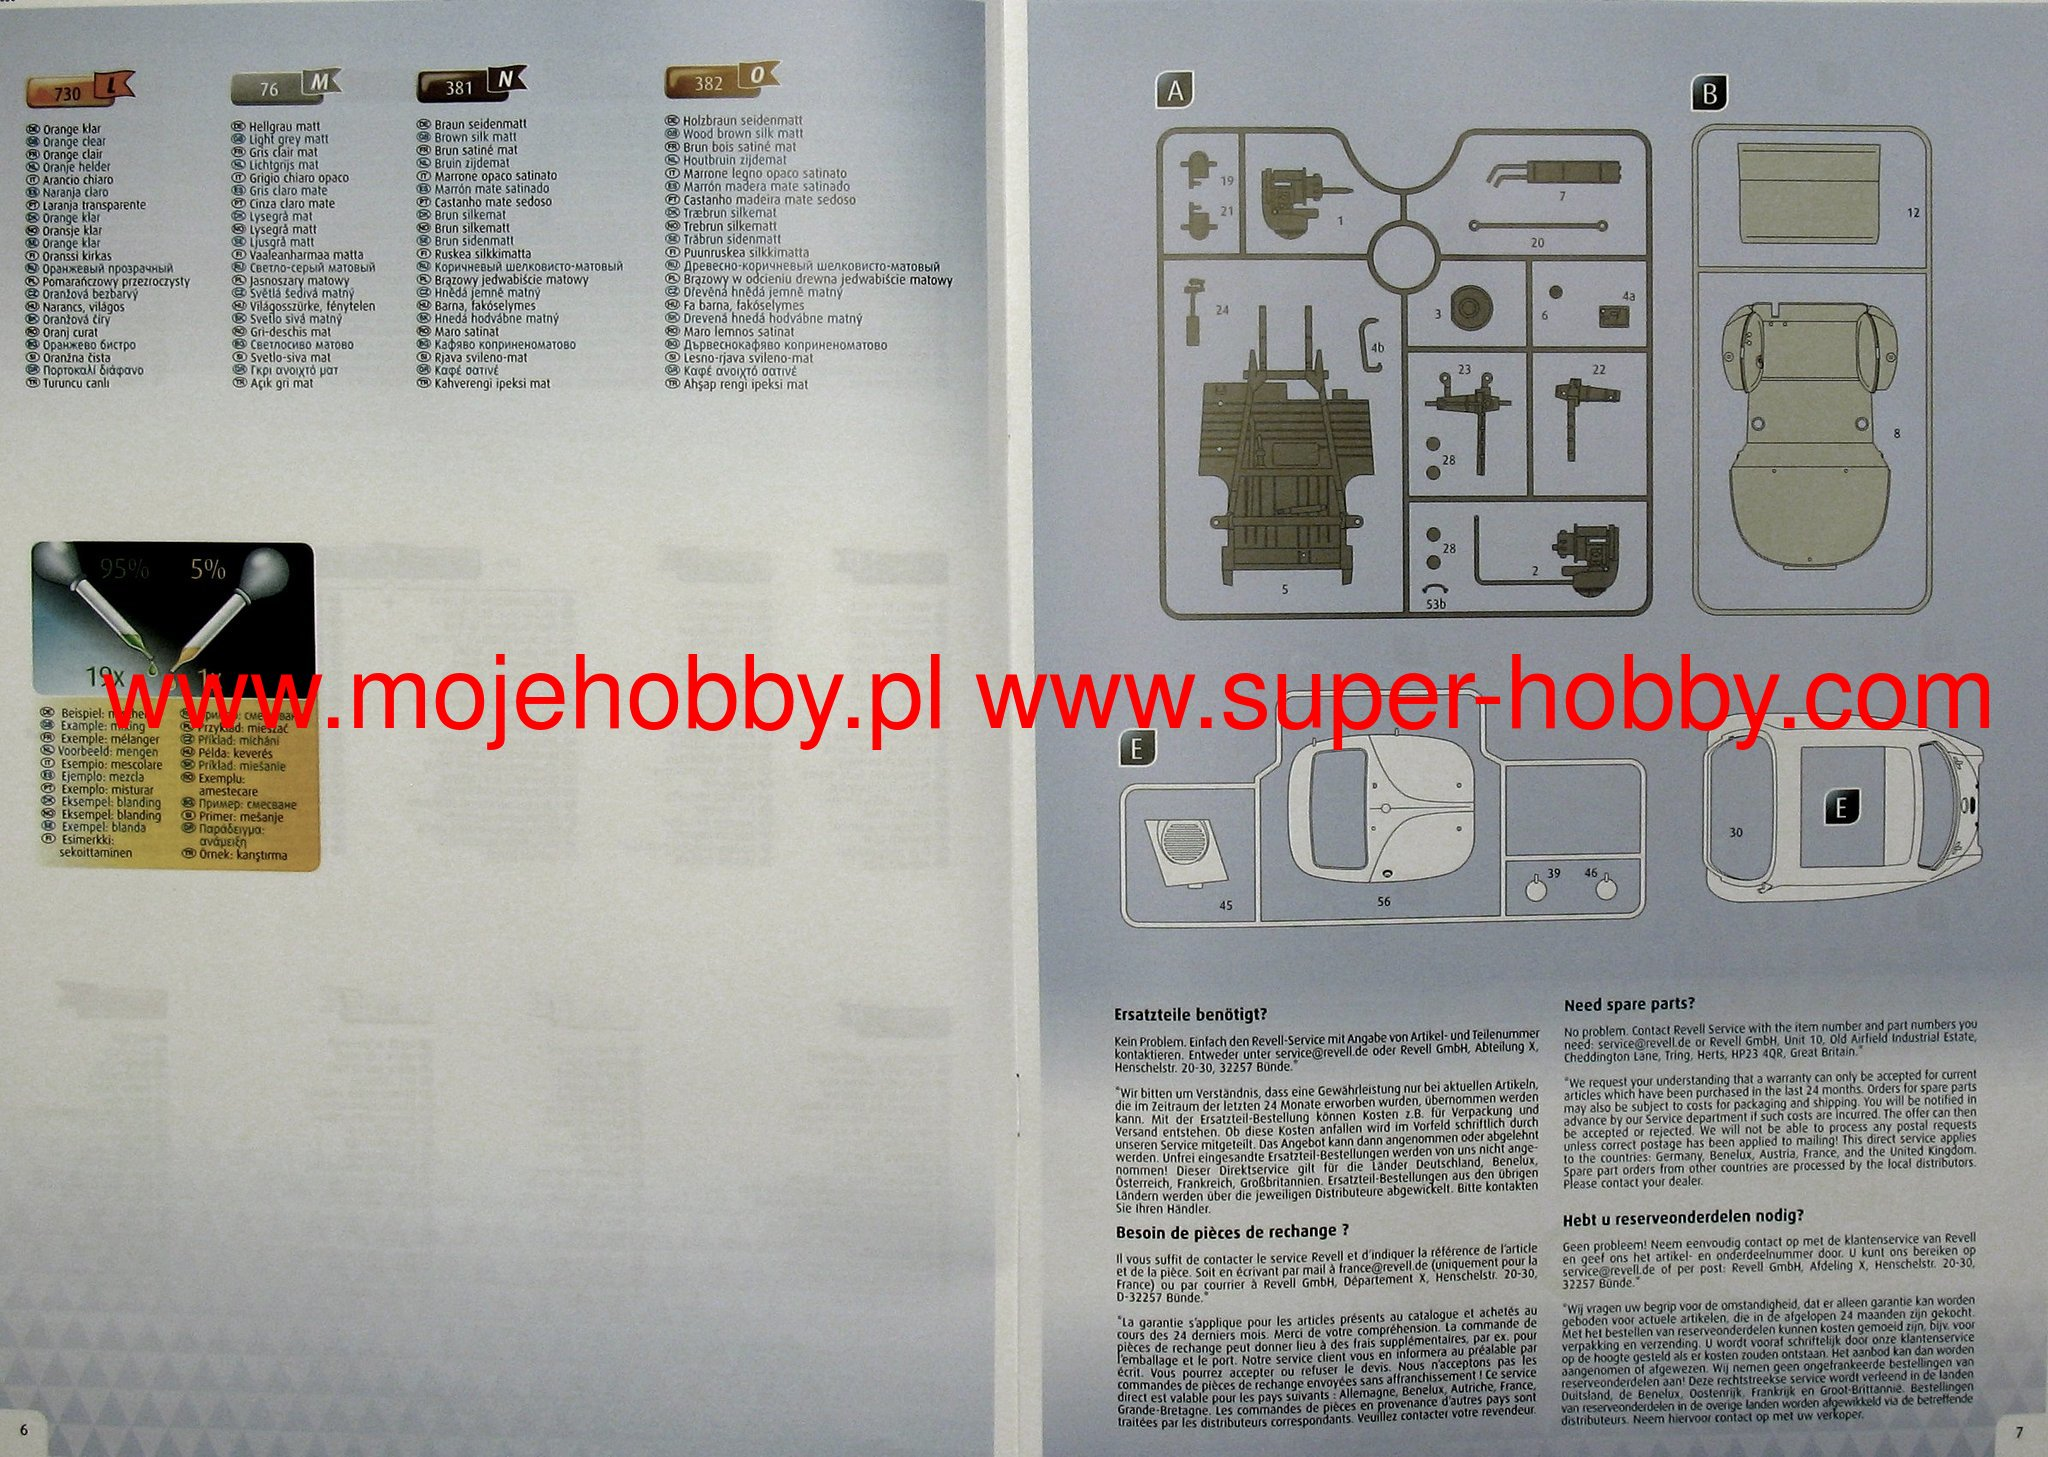 17475_2_rev07030_3 isetta wiring diagram crosley wiring diagram, bmw wiring diagram  at soozxer.org